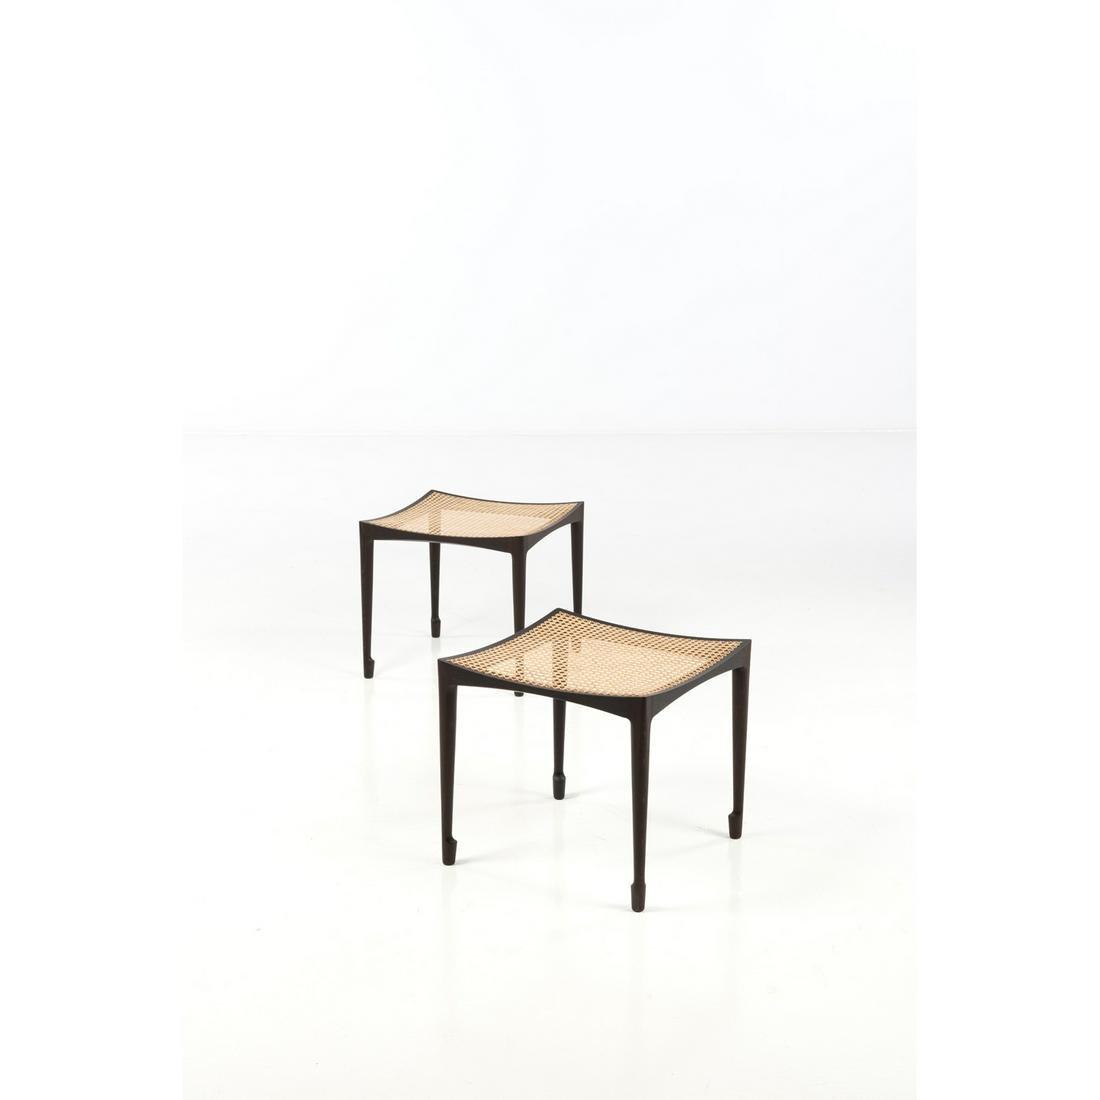 Bernt Petersen (1937-2017) Pair of stools Wenge and